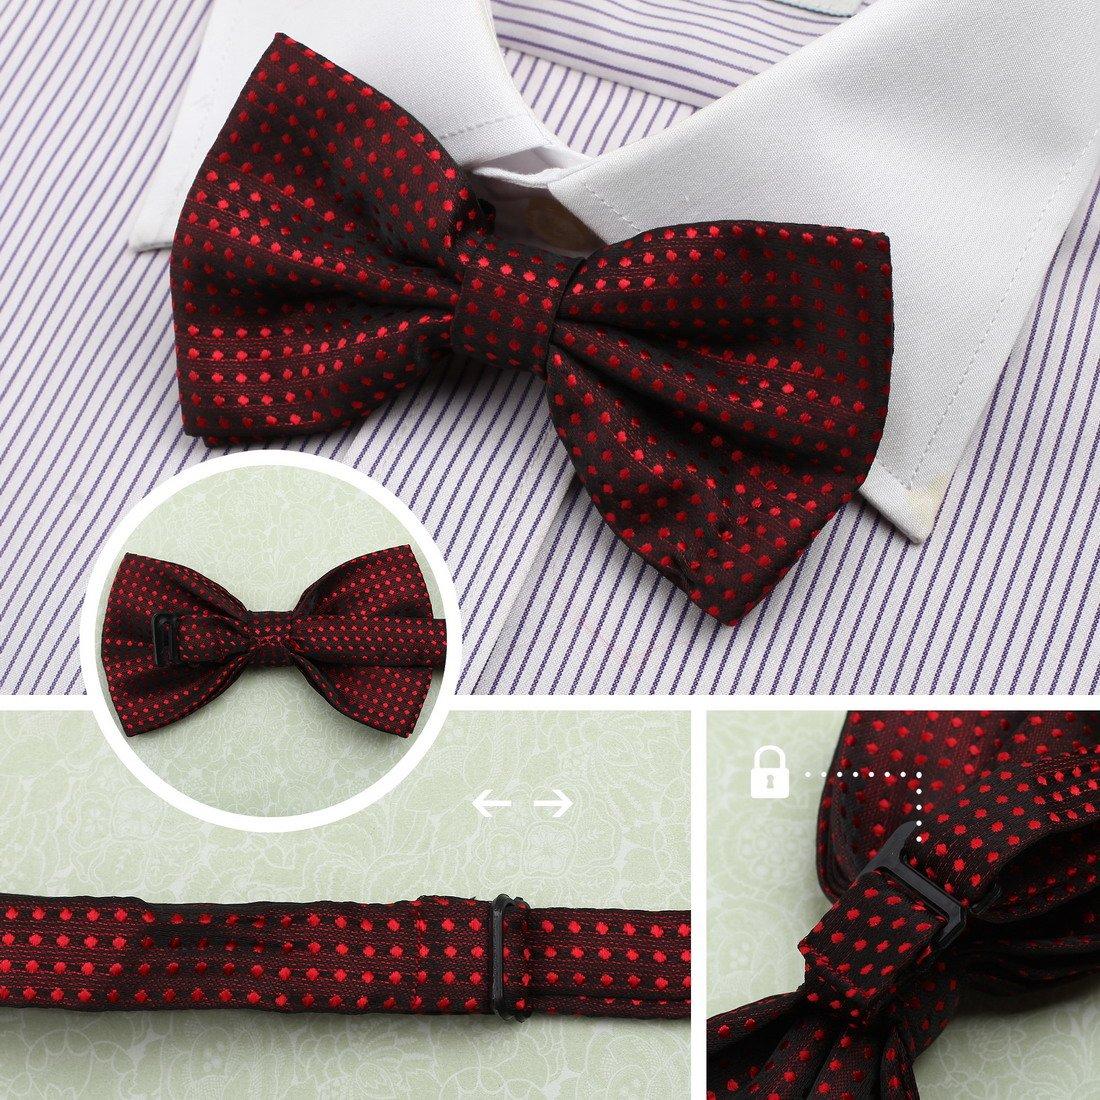 DBE0167 Groomsmen Pre-Tied Microfiber Bow ties Popular For Teen 3 Pack Bow Tie Set By Dan Smith by Dan Smith (Image #4)